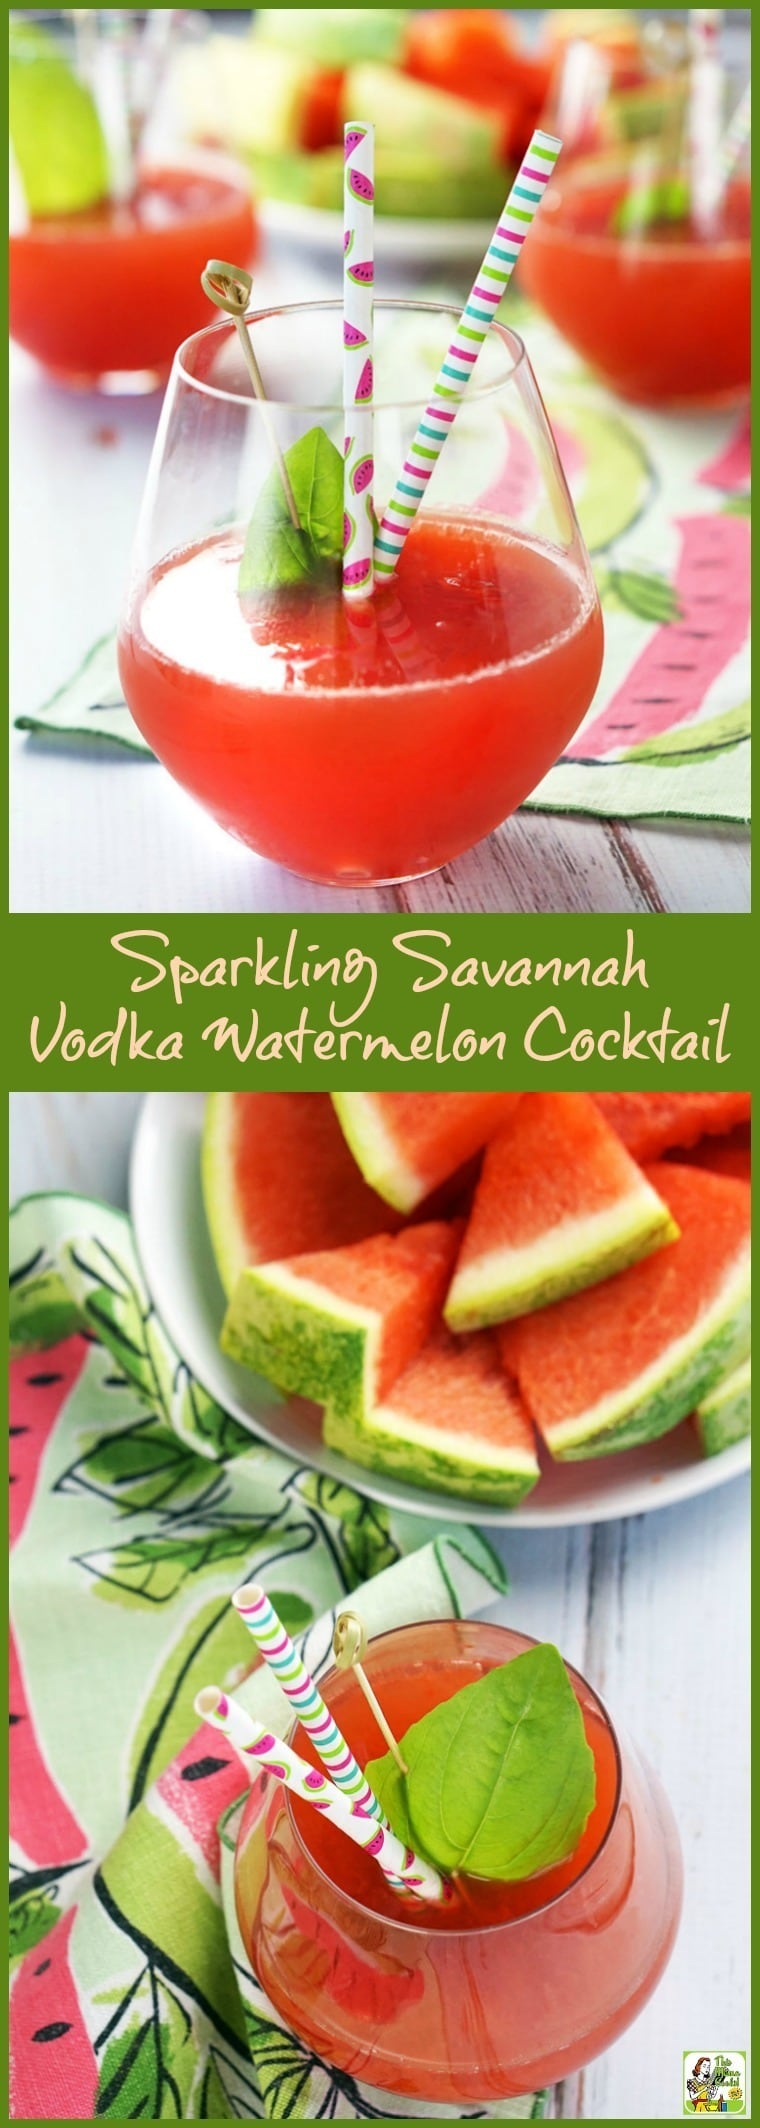 The best fresh watermelon cocktail! Make this Sparkling Savannah Vodka Watermelon Cocktail recipe with fresh watermelon juice, vodka, sparkling wine, and St. Germain liqueur. You\'ll love this refreshing watermelon cocktail recipe. #recipe #easy #recipeoftheday #glutenfree #easyrecipes #watermelon #juice #cocktail #cocktailrecipe #drinks #drinkrecipe #vodka #sparklingwine #wine